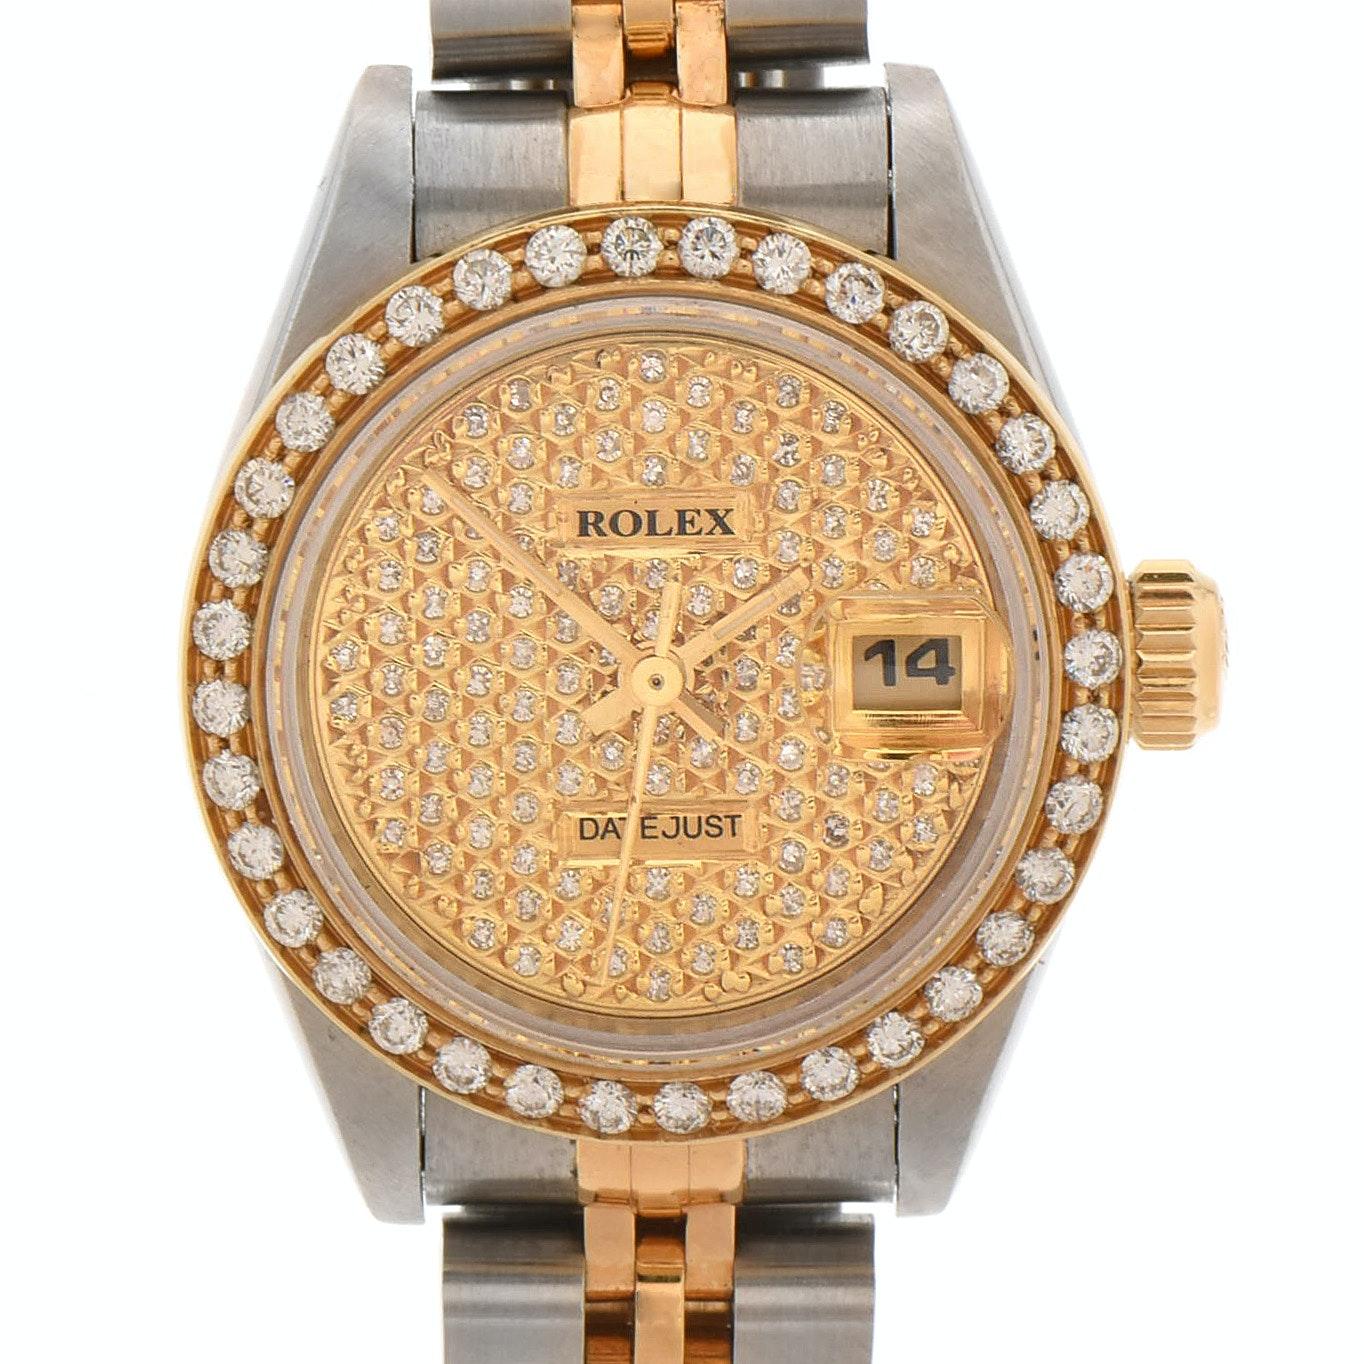 Rolex Datejust 18K Yellow Gold and Stainless Steel Diamond Wristwatch Circa 1993